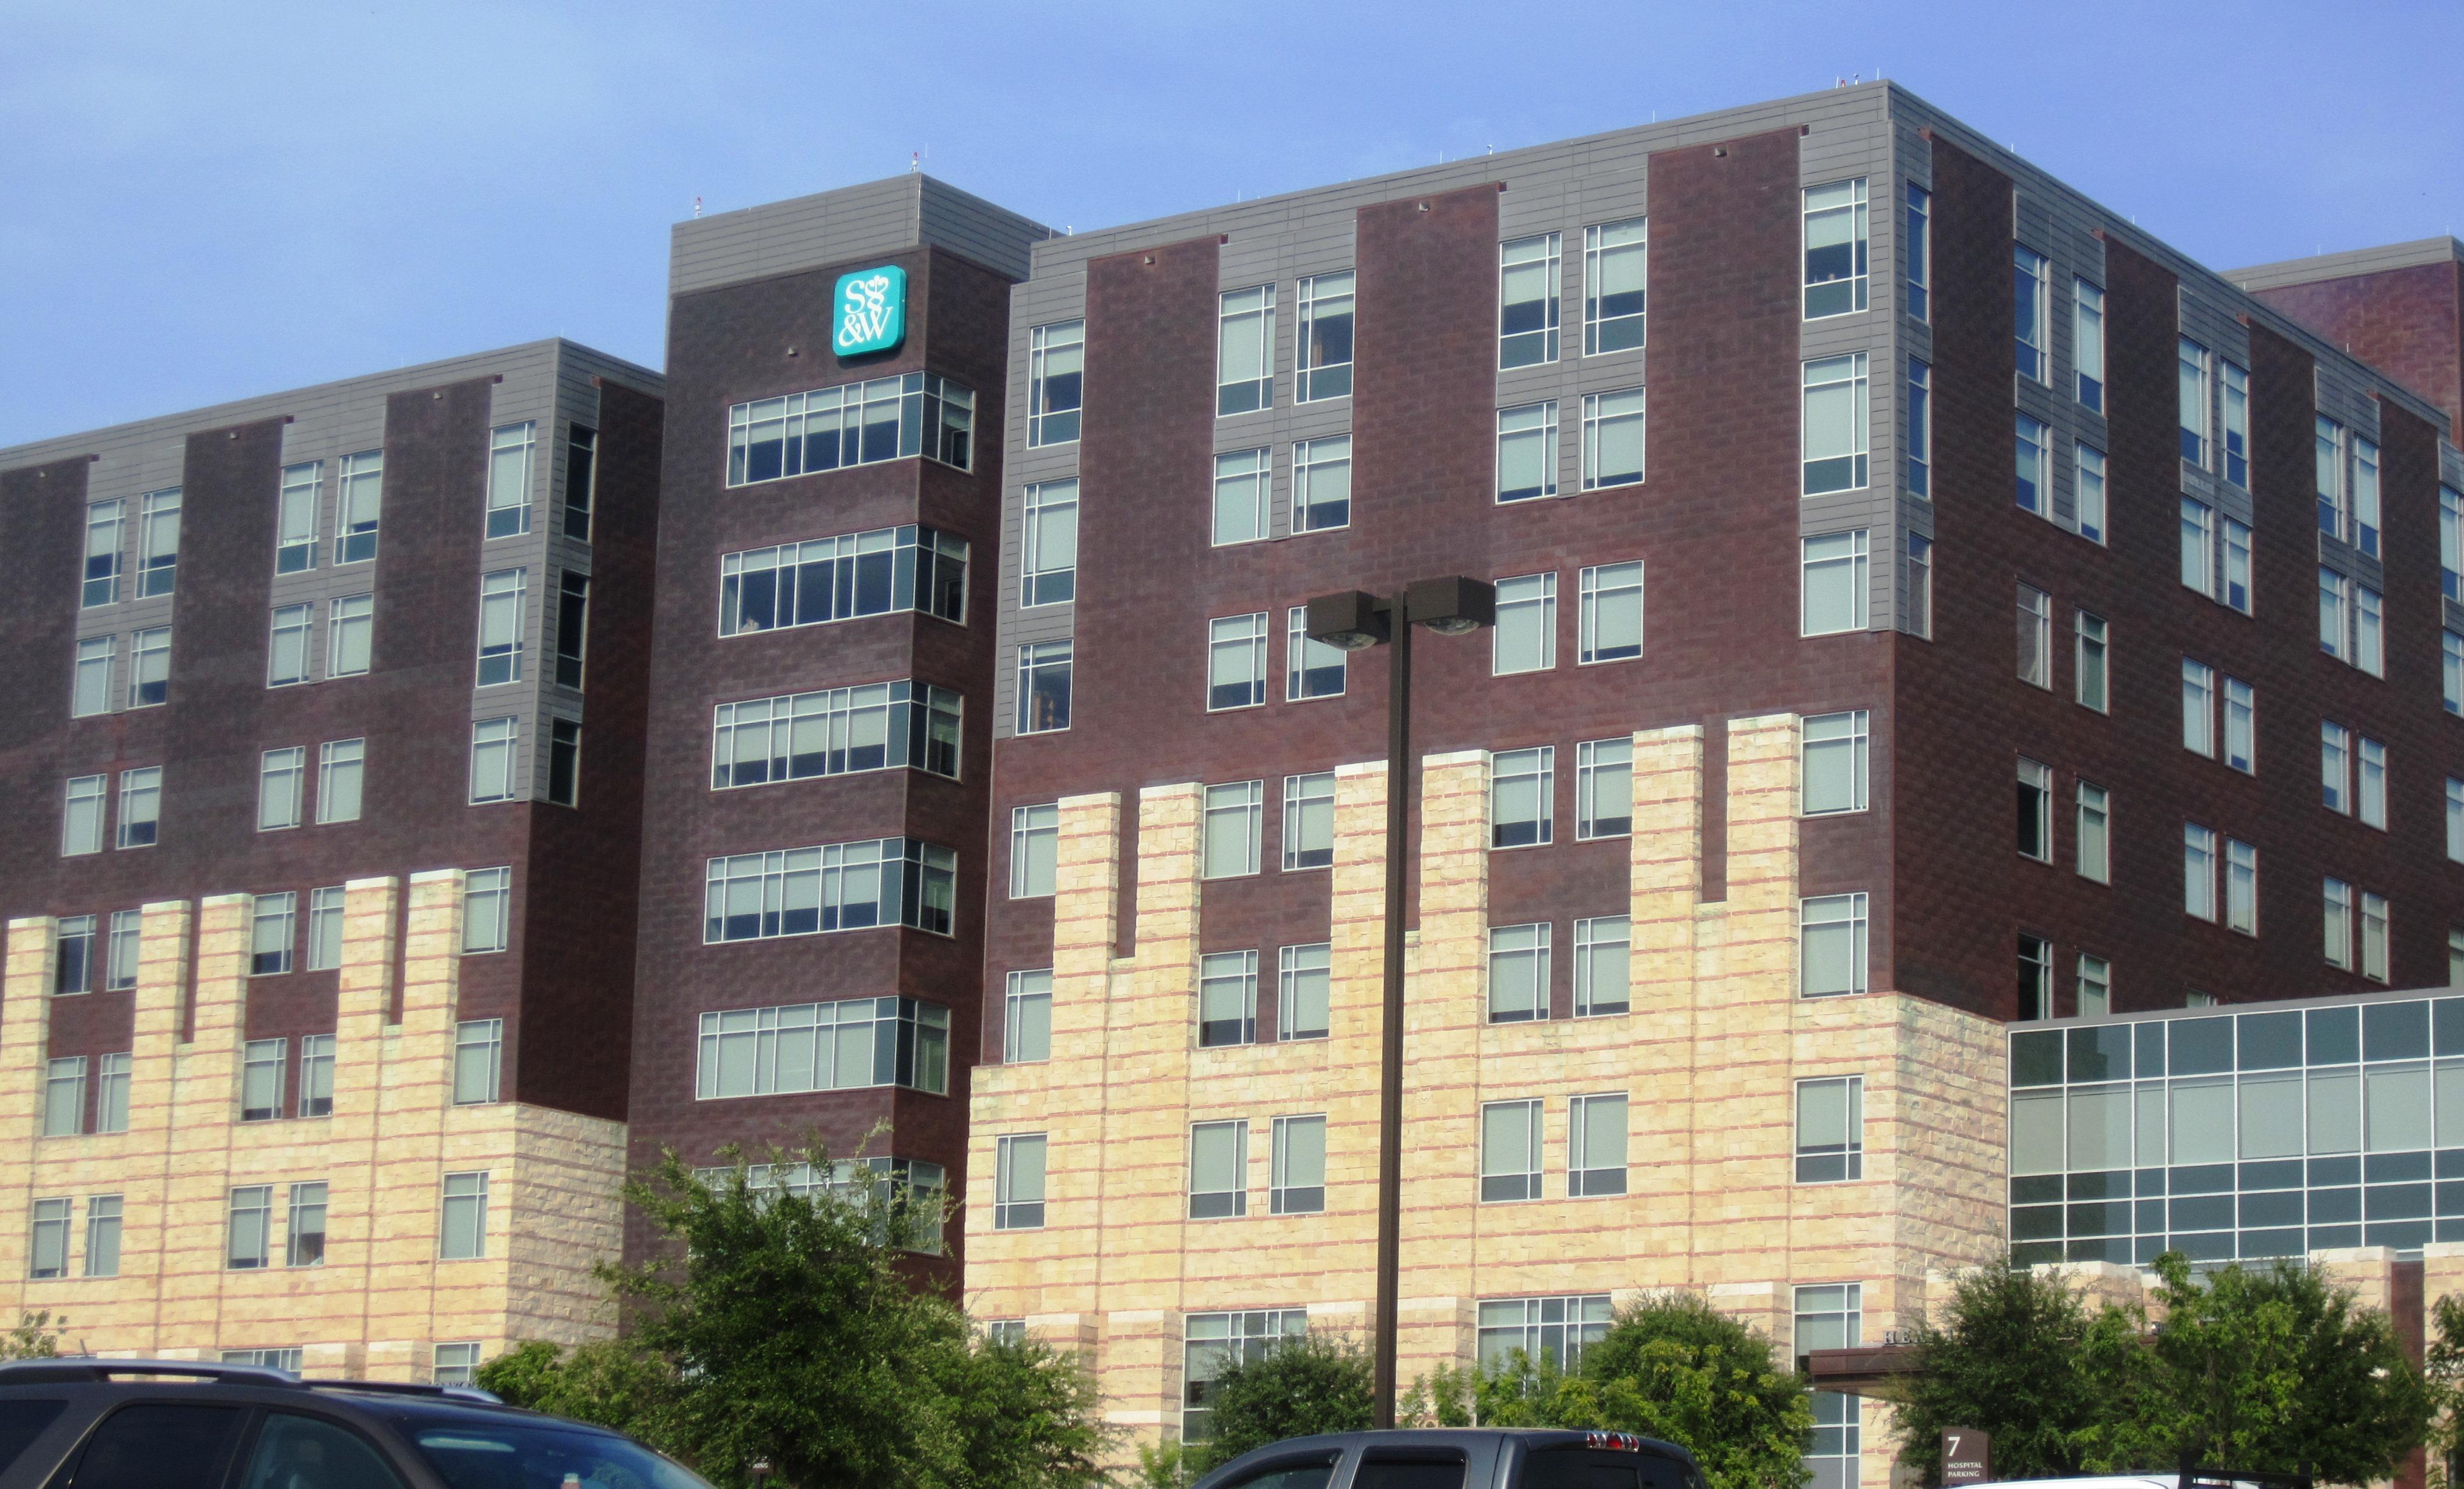 Scott & White Medical Center - Wikipedia - Baylor Hospital Dallas Texas Map